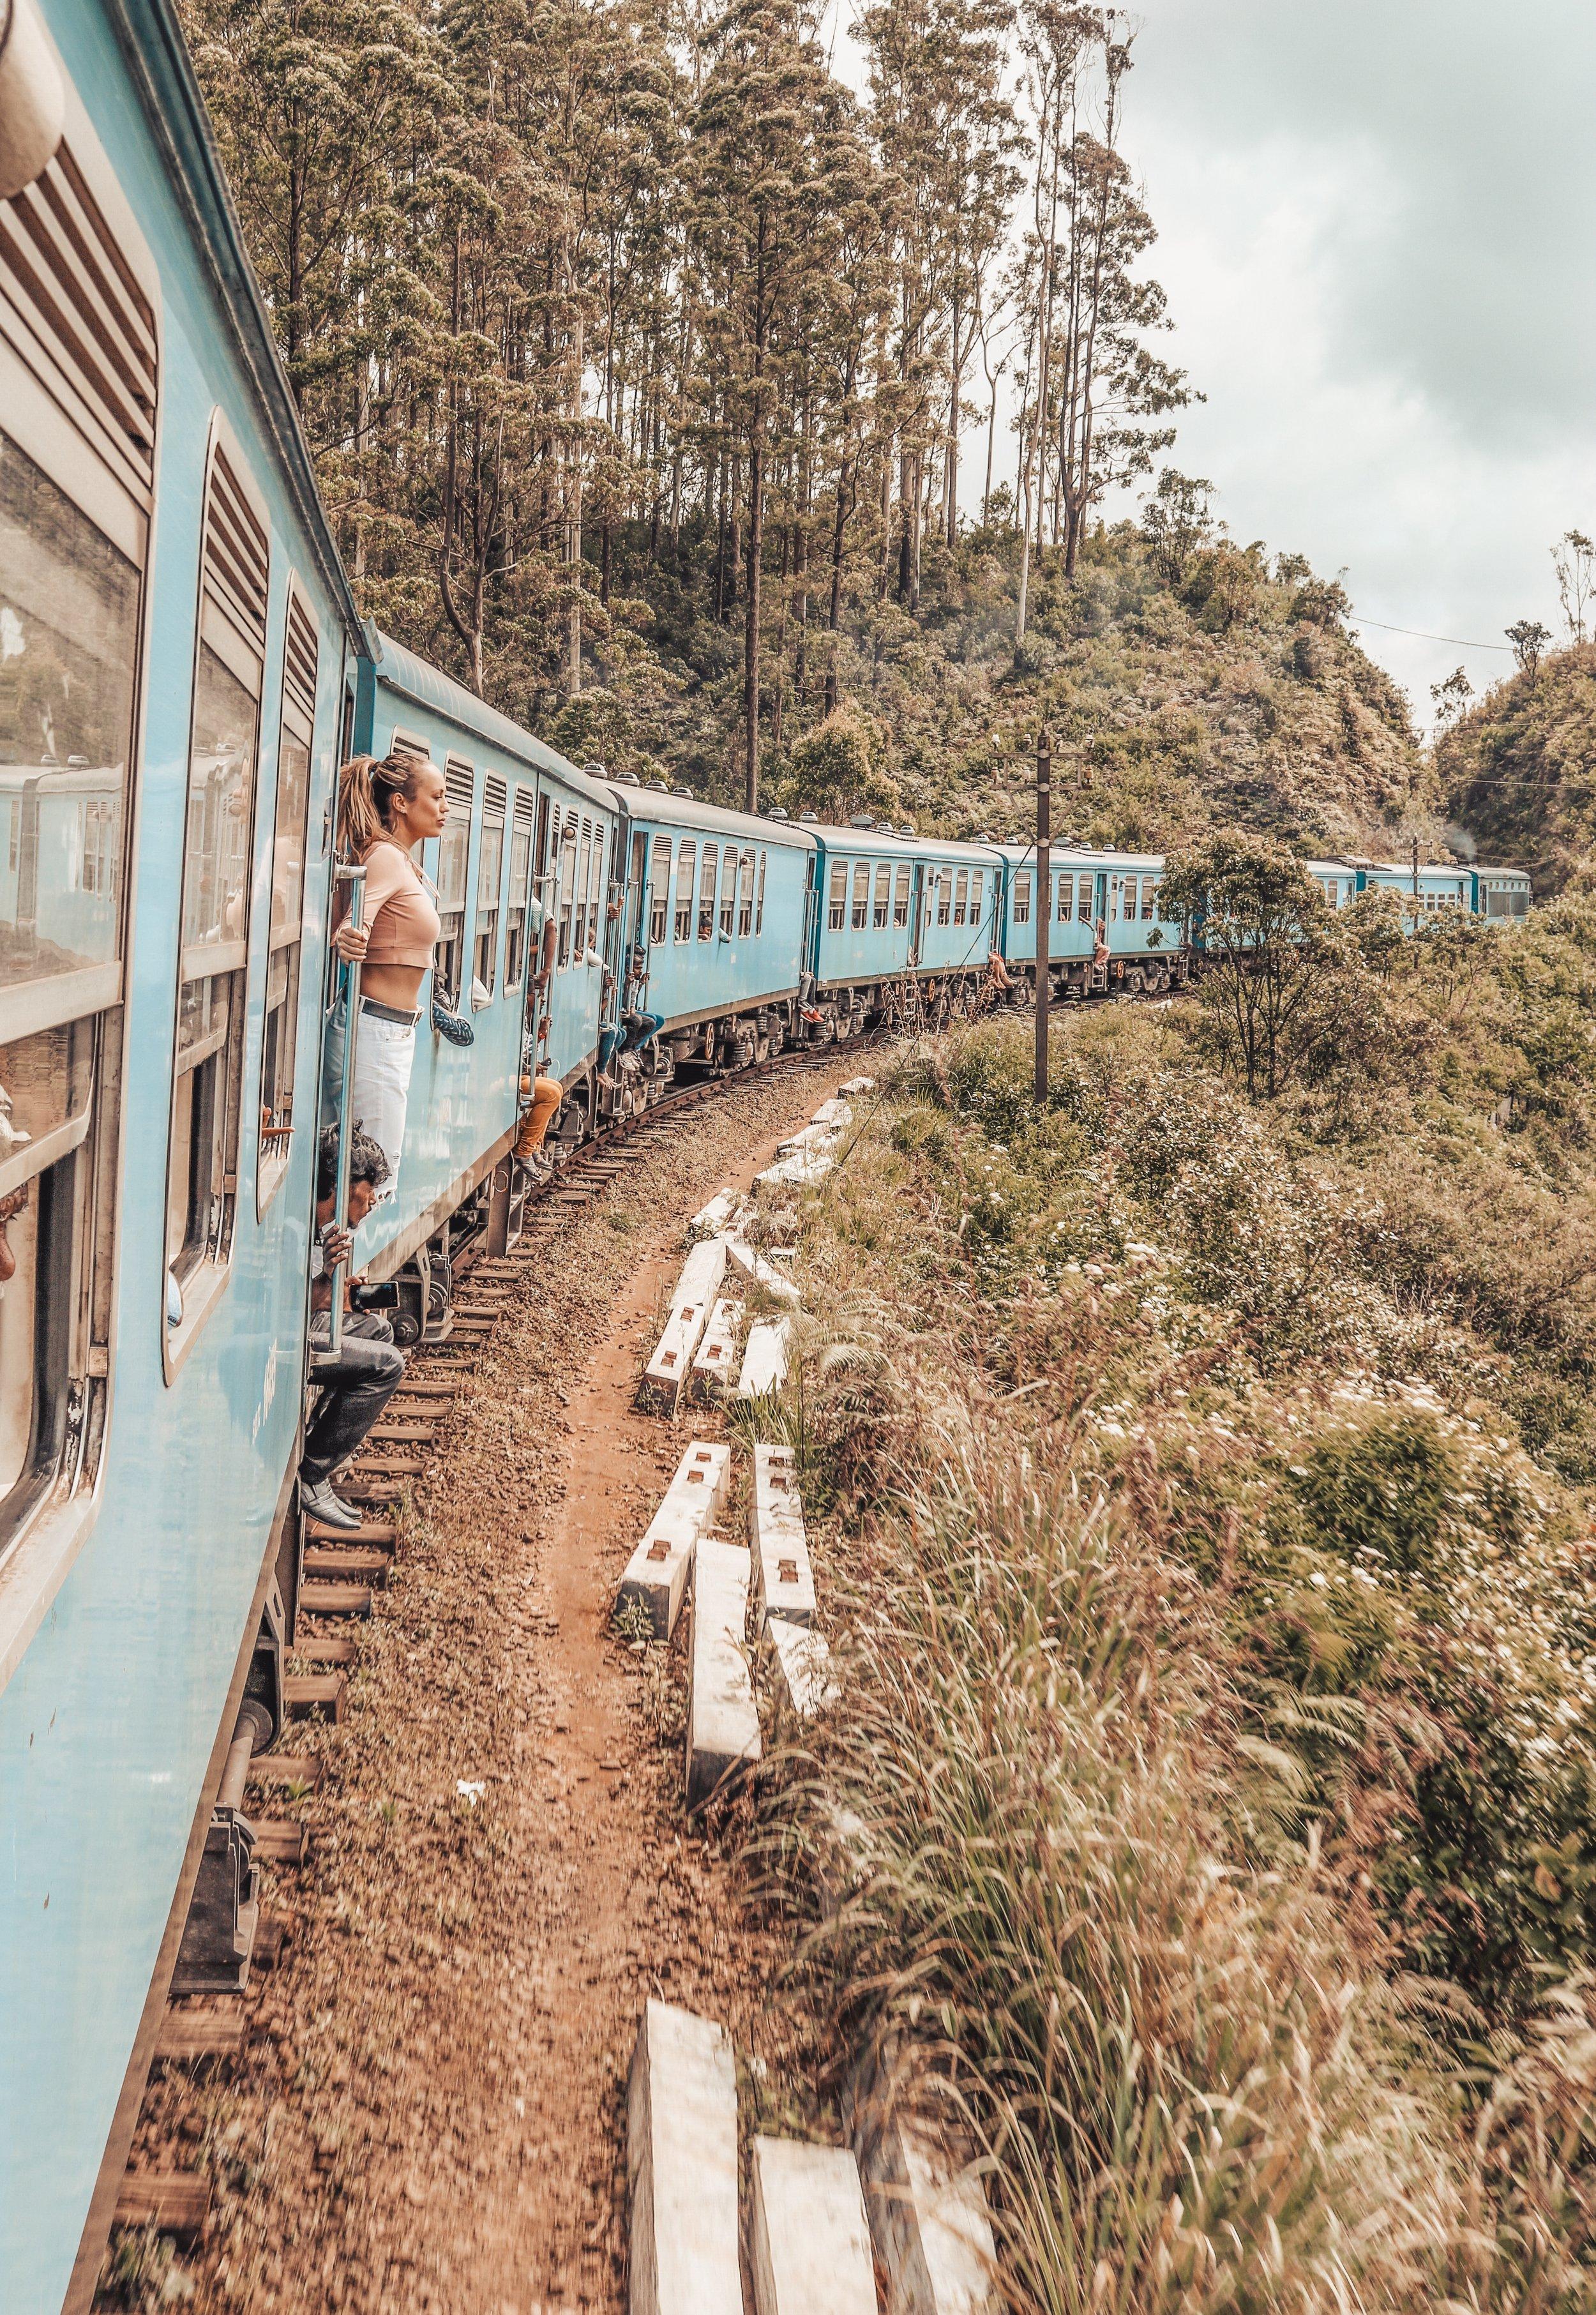 sri-lanka-train.jpg